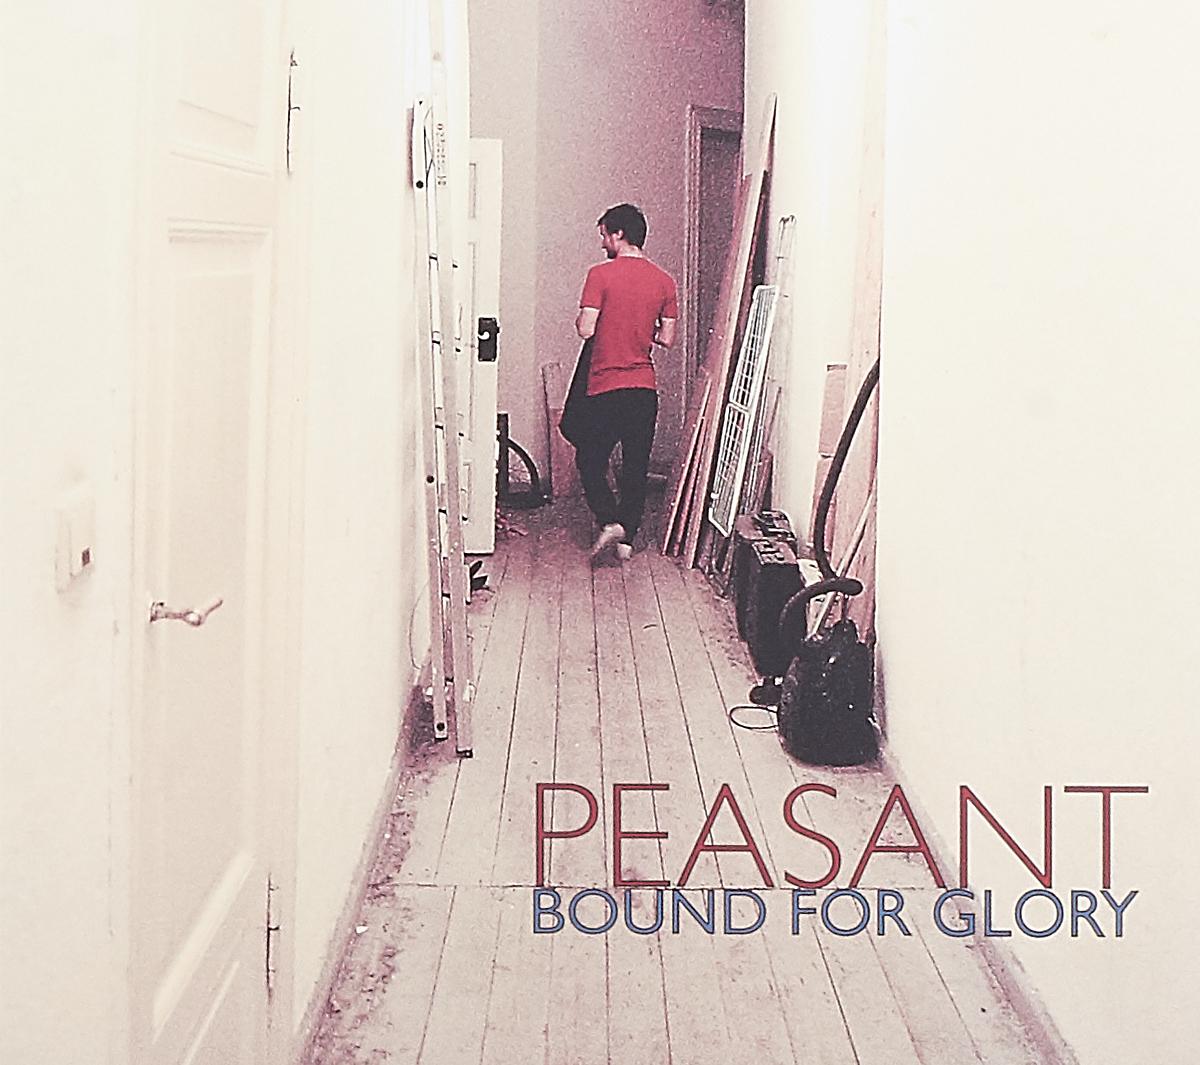 Peasant Peasant. Bound For Glory